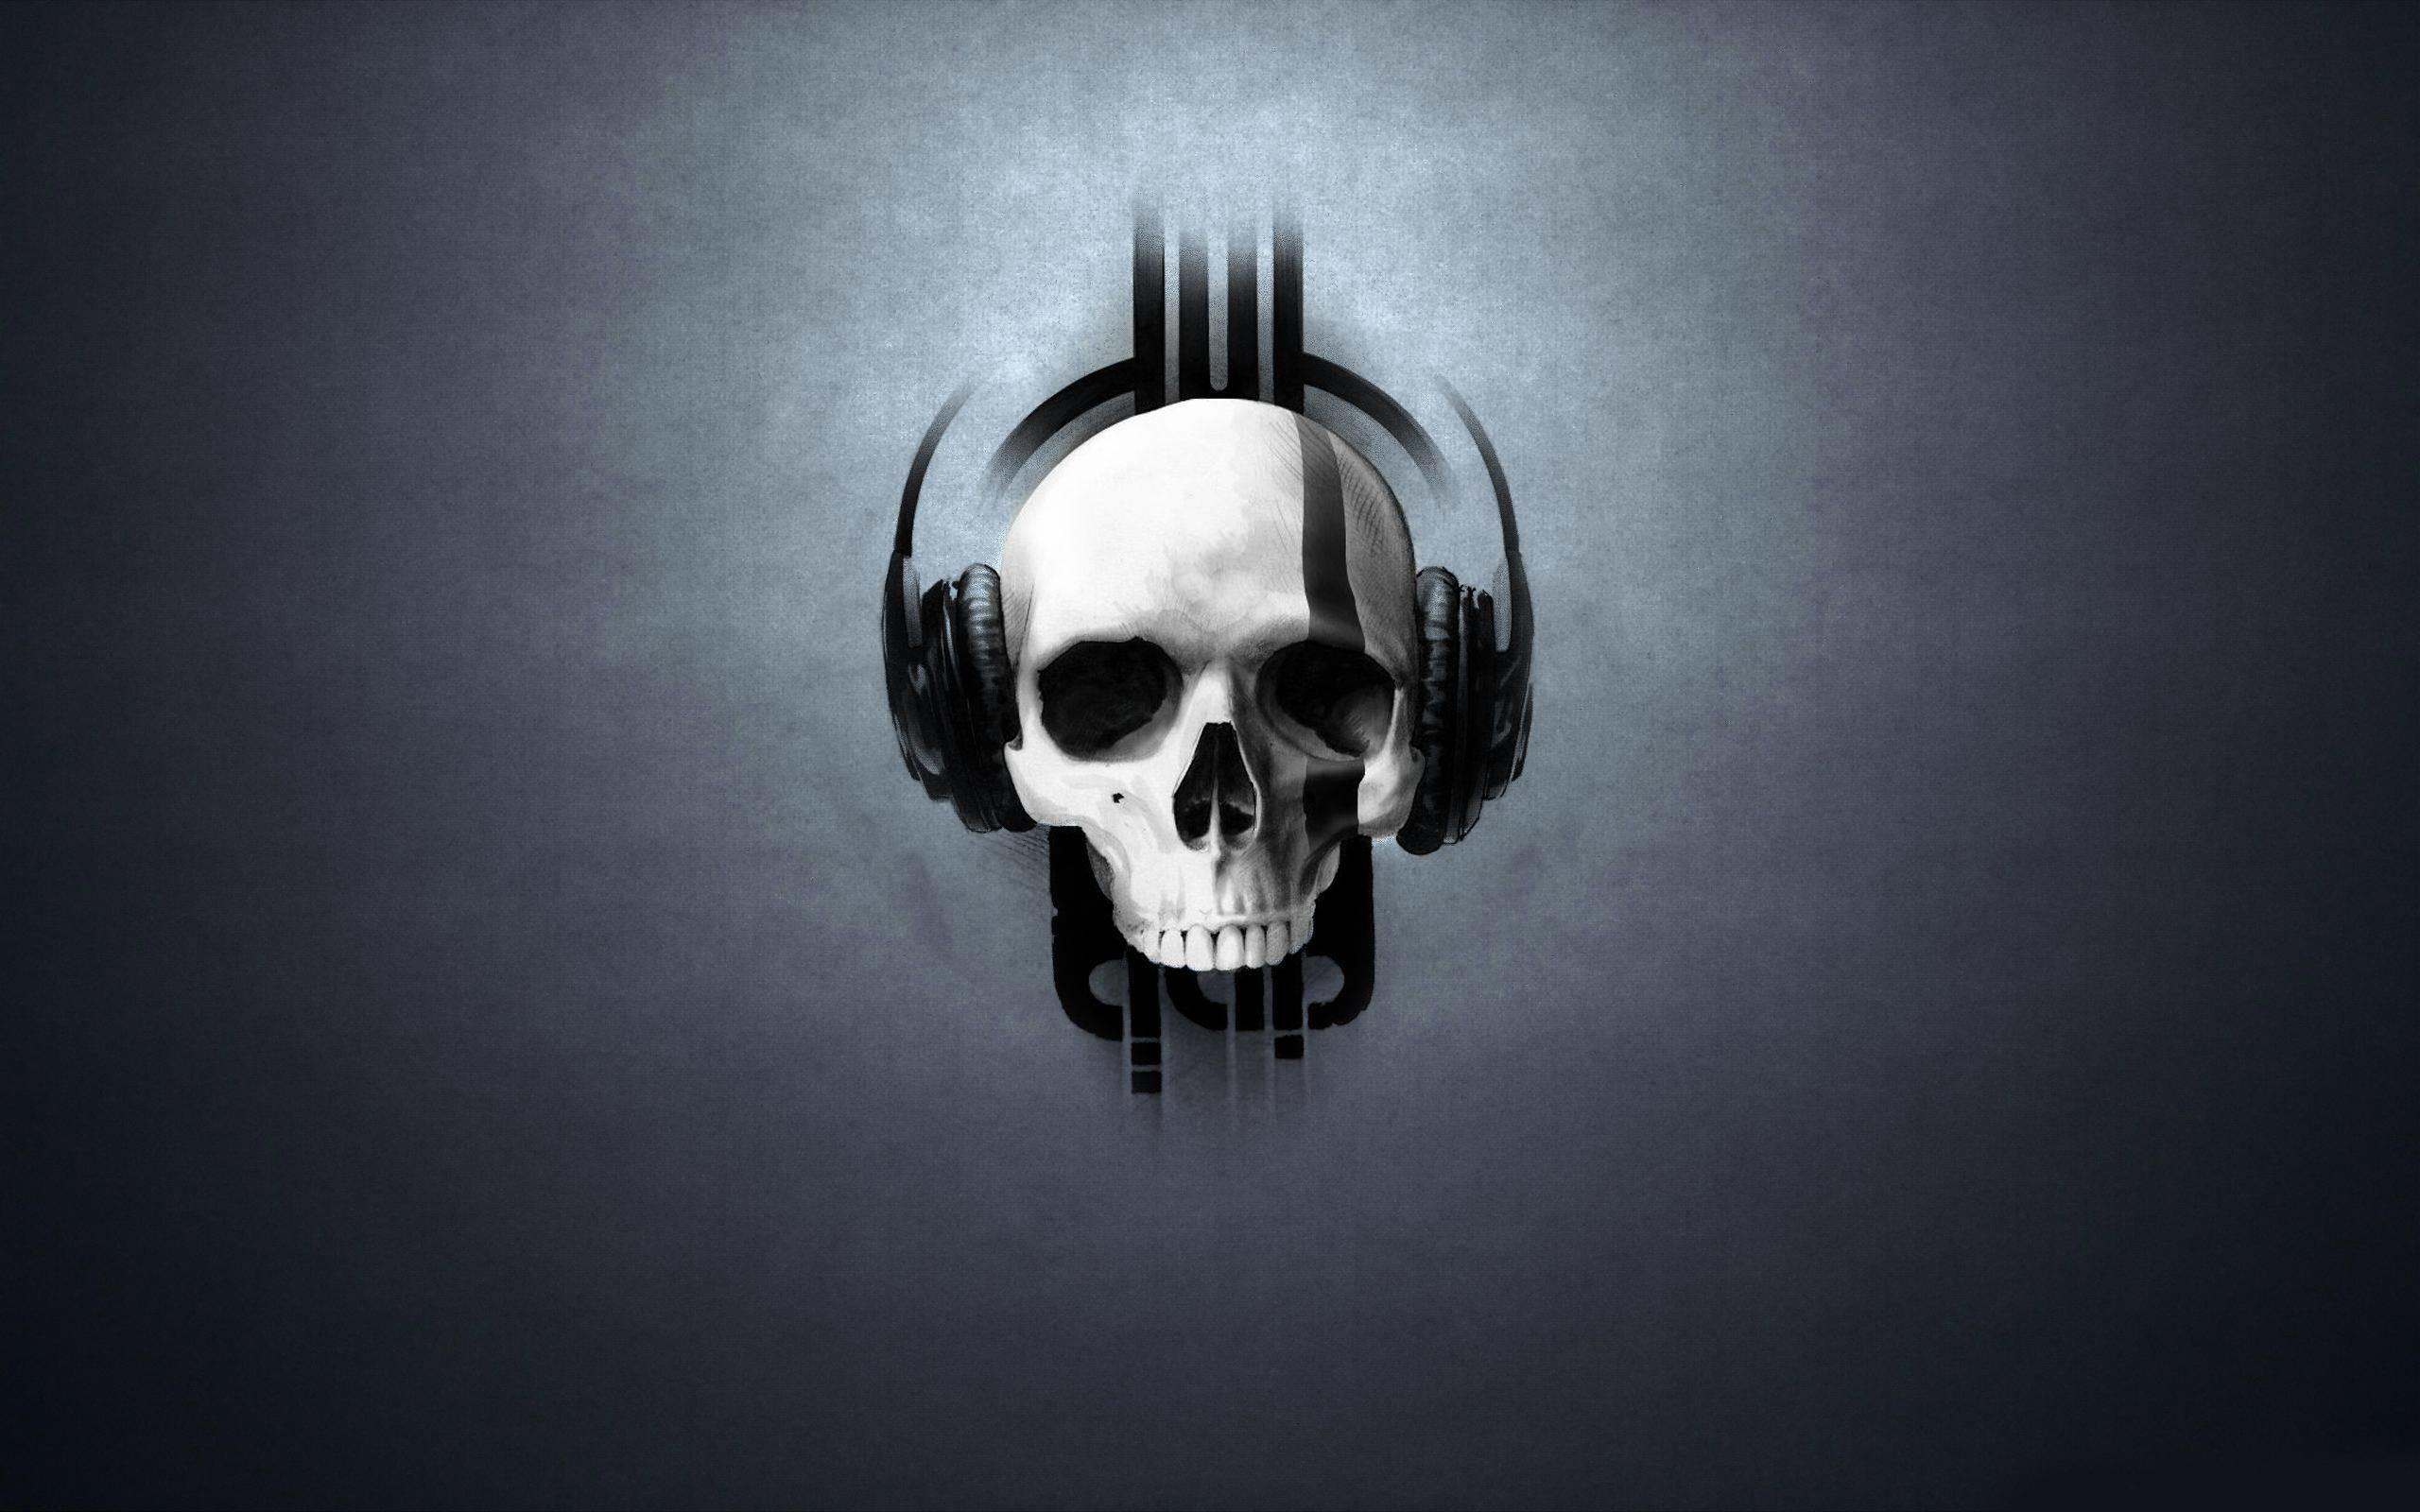 wallpaper skulls (59+ images)